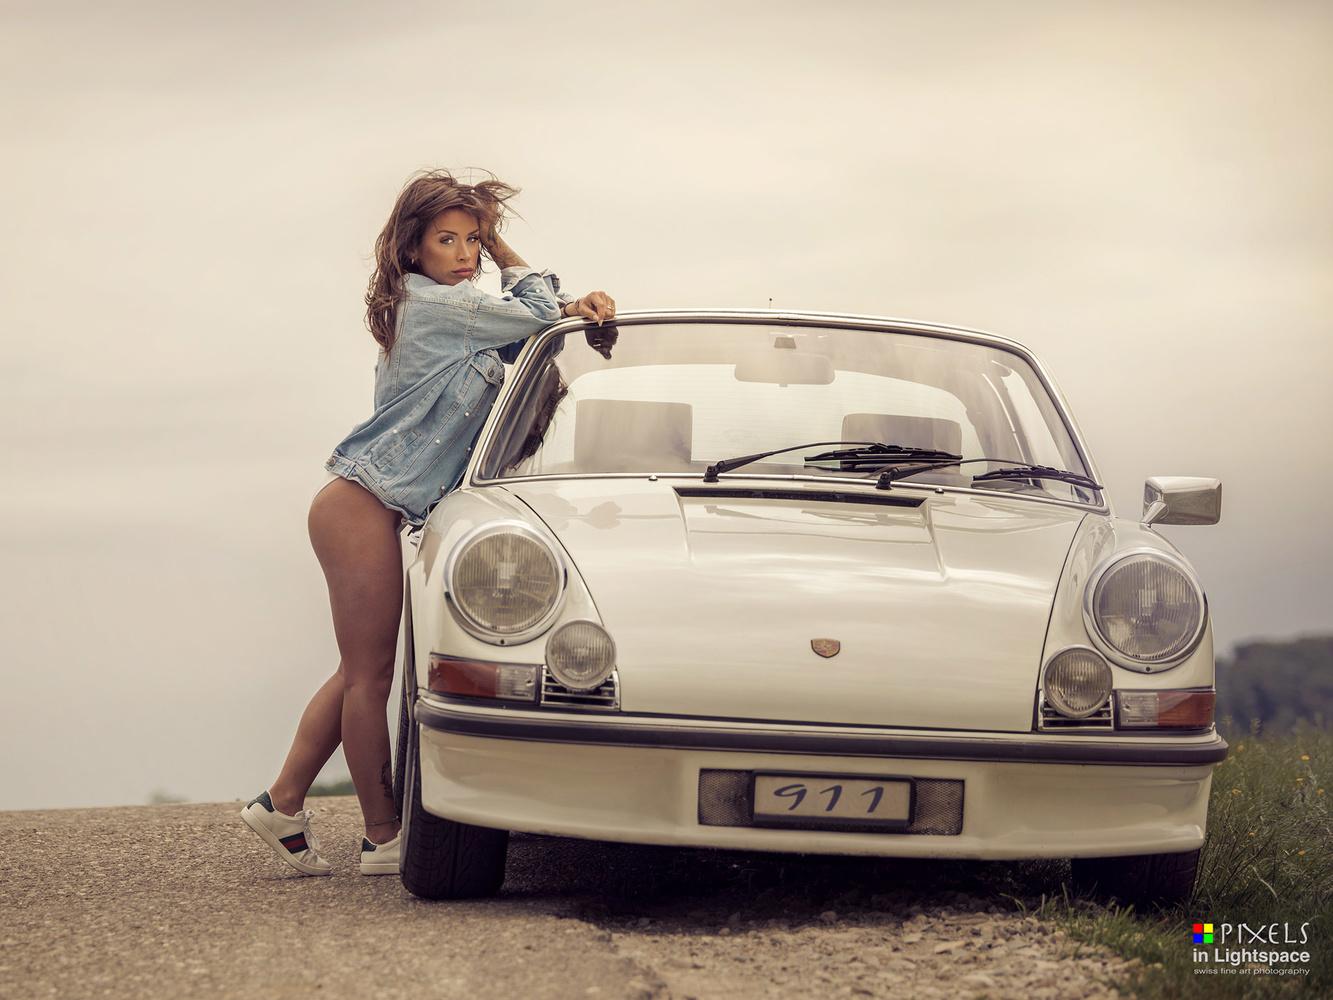 Hot time traveler by Mladen Dakic